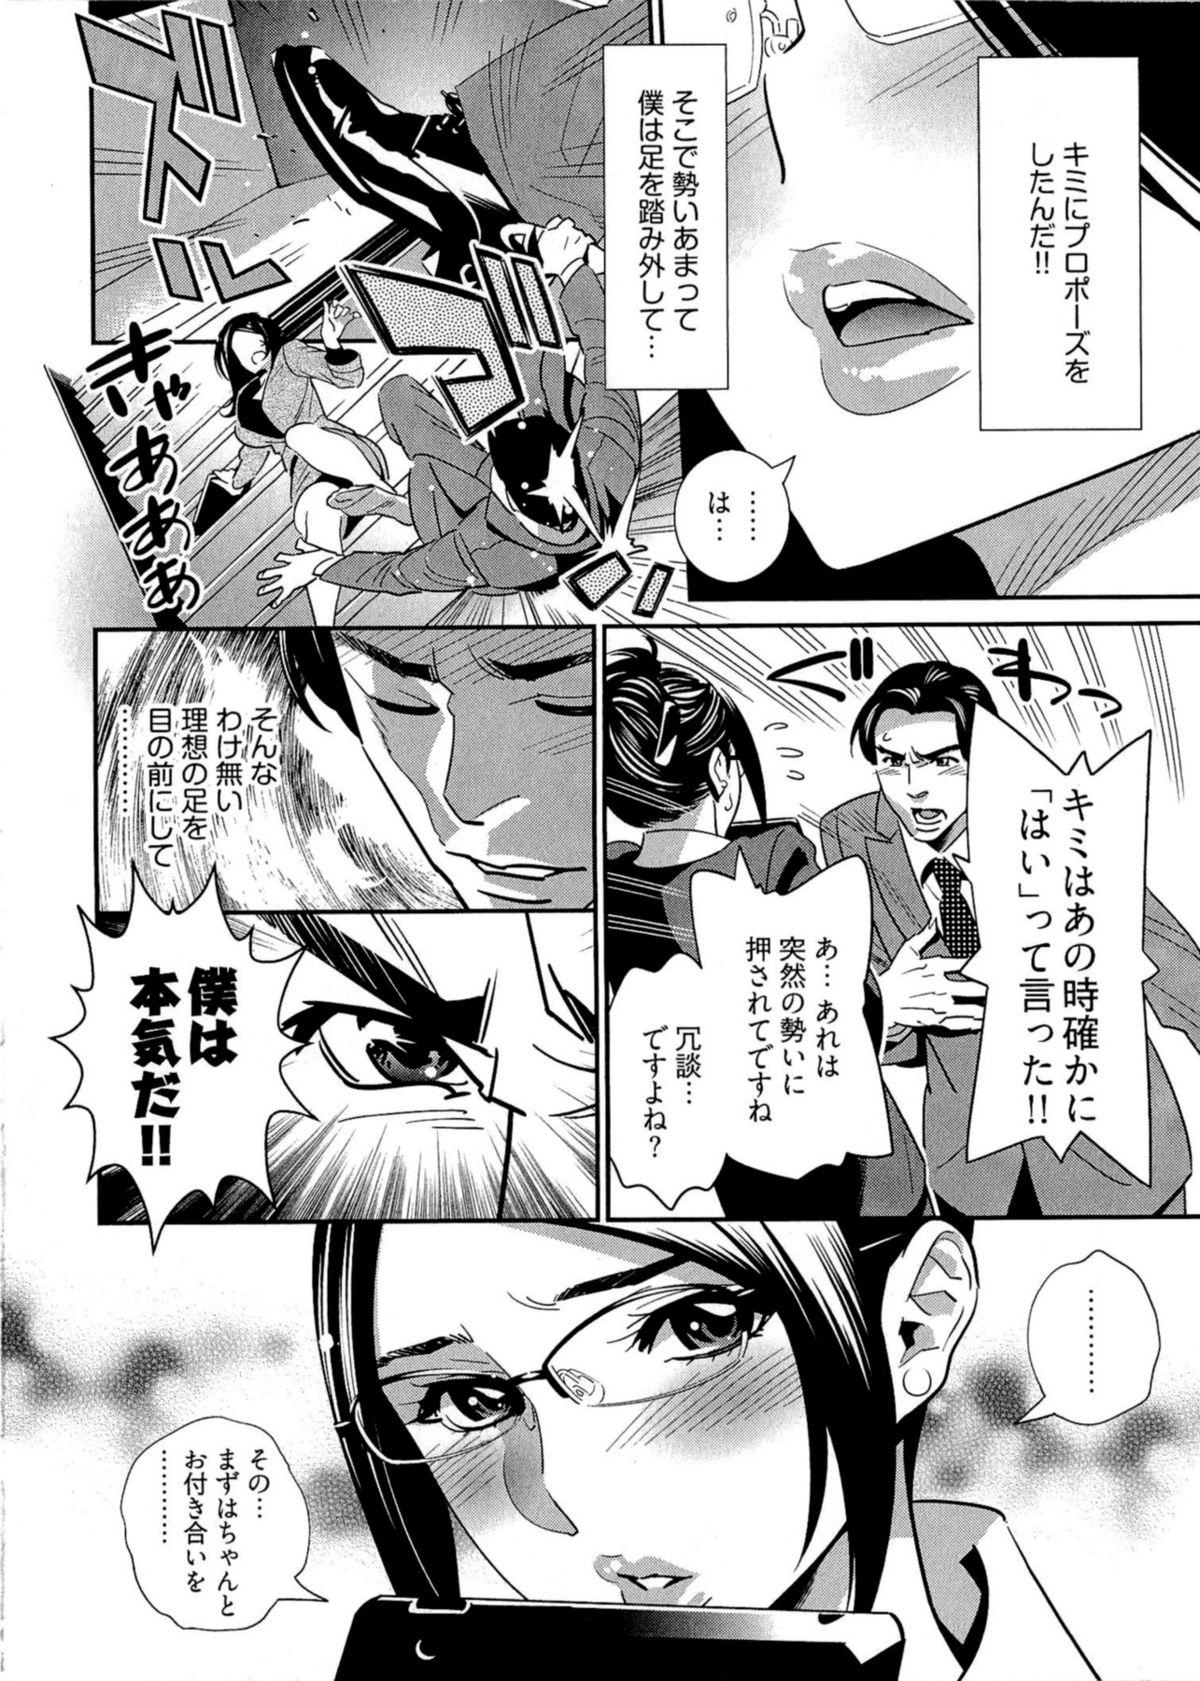 5ji kara Honban! - After Five Working! 112